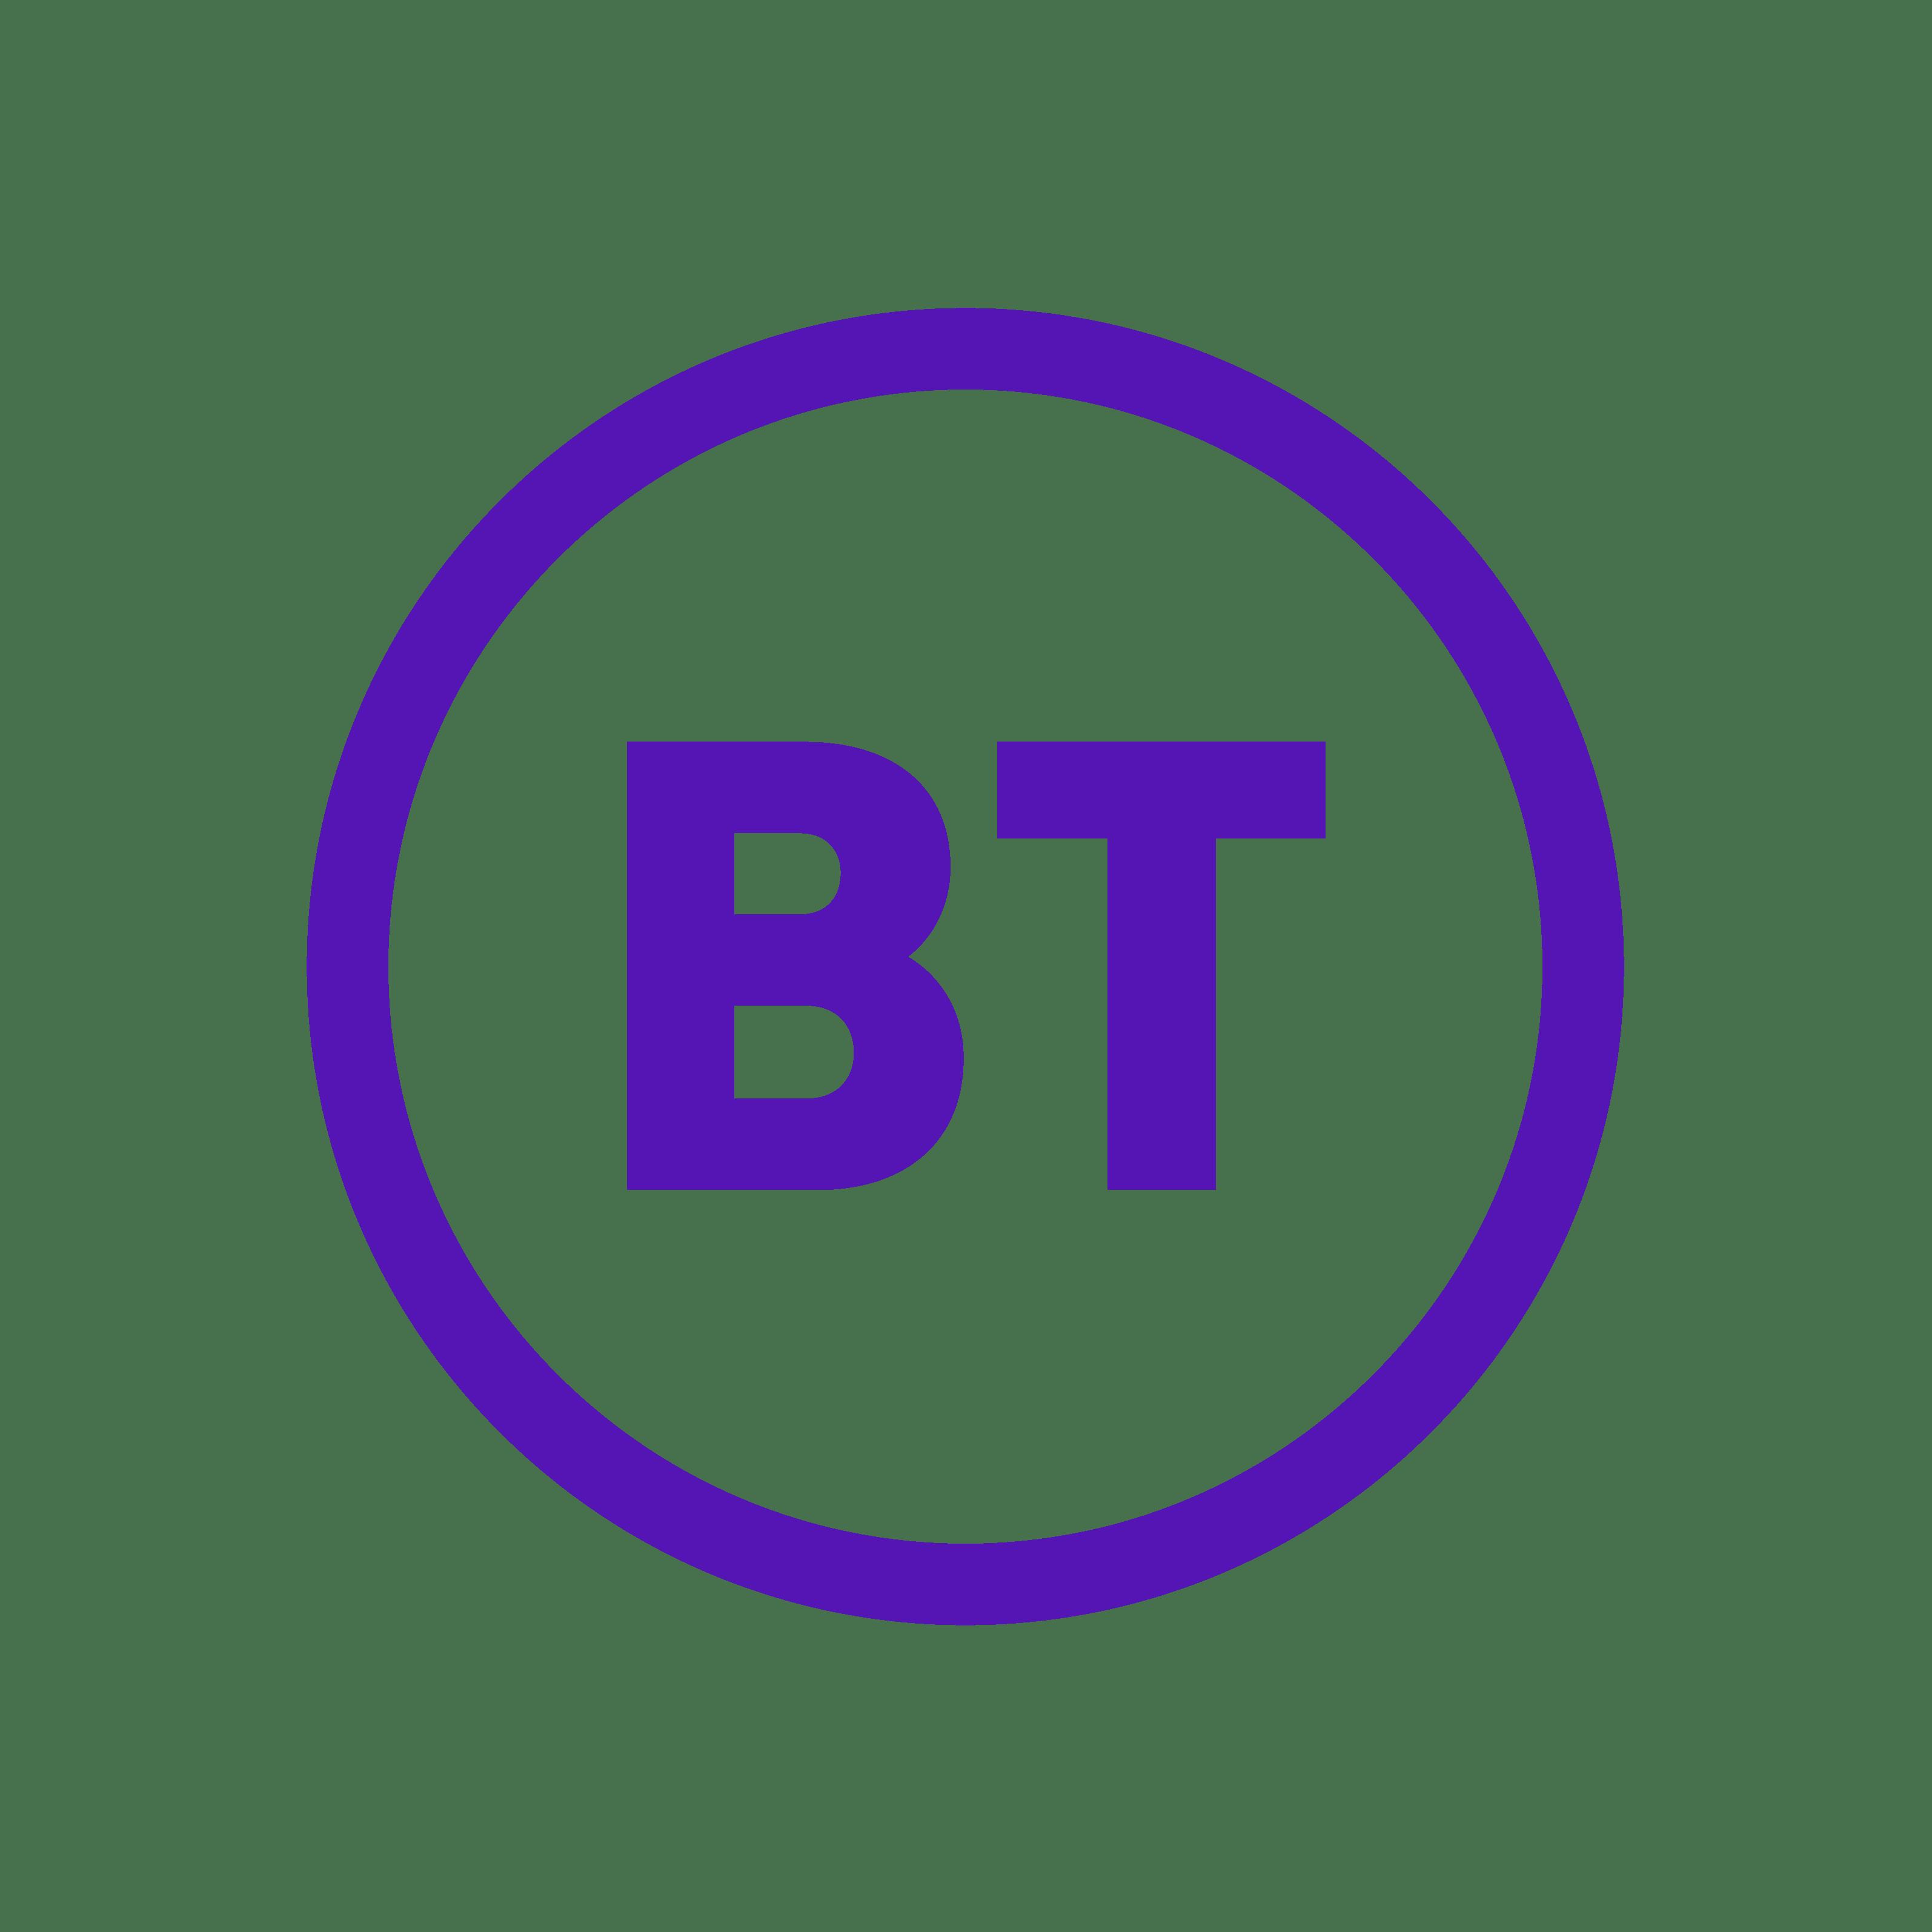 BT calls on PTSG's services